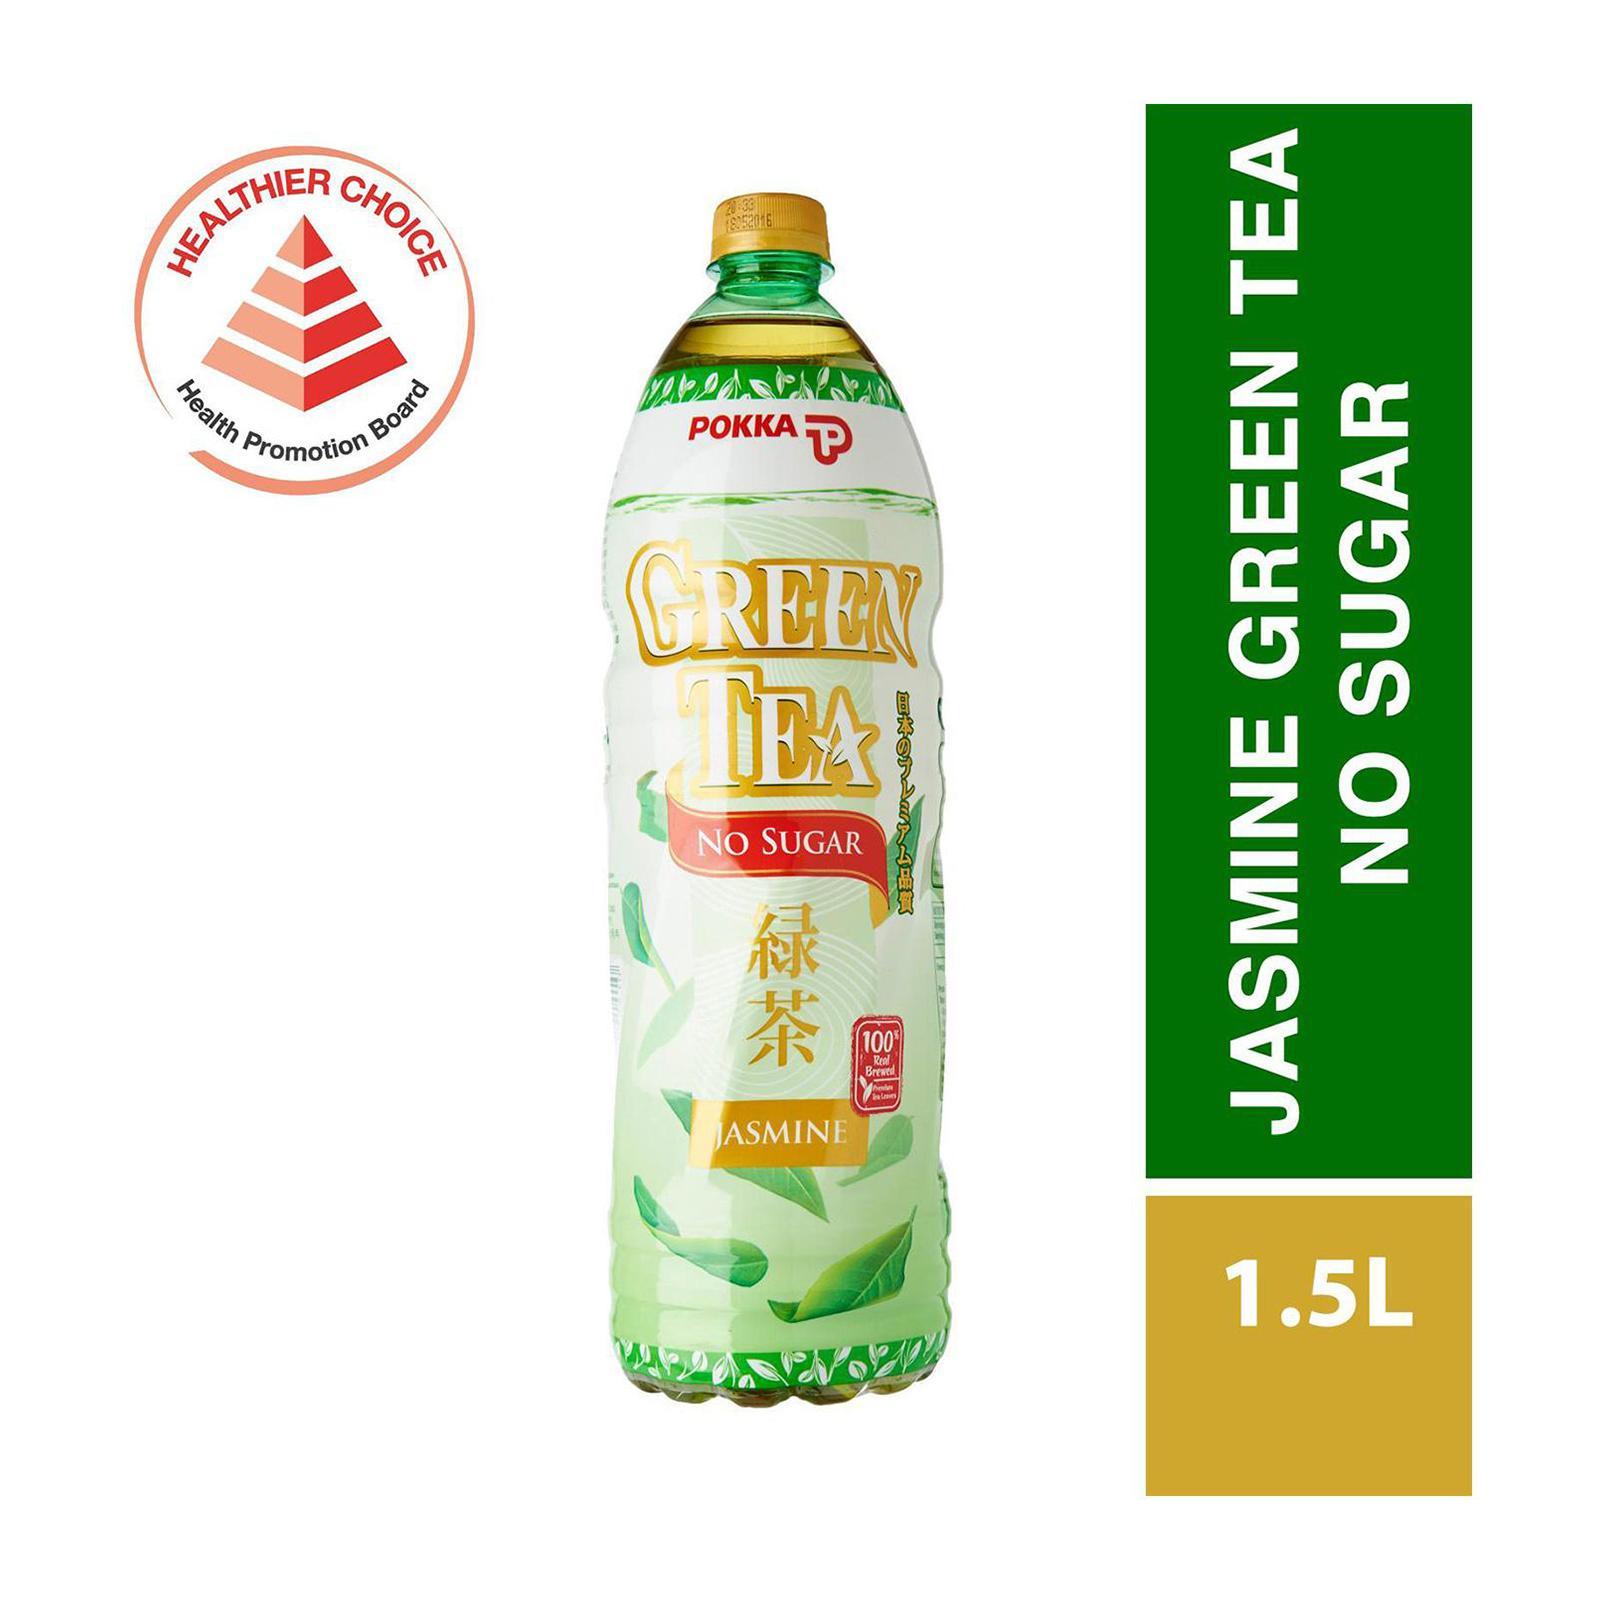 Pokka Bottle Drink - Jasmine Green Tea (No Sugar Added)